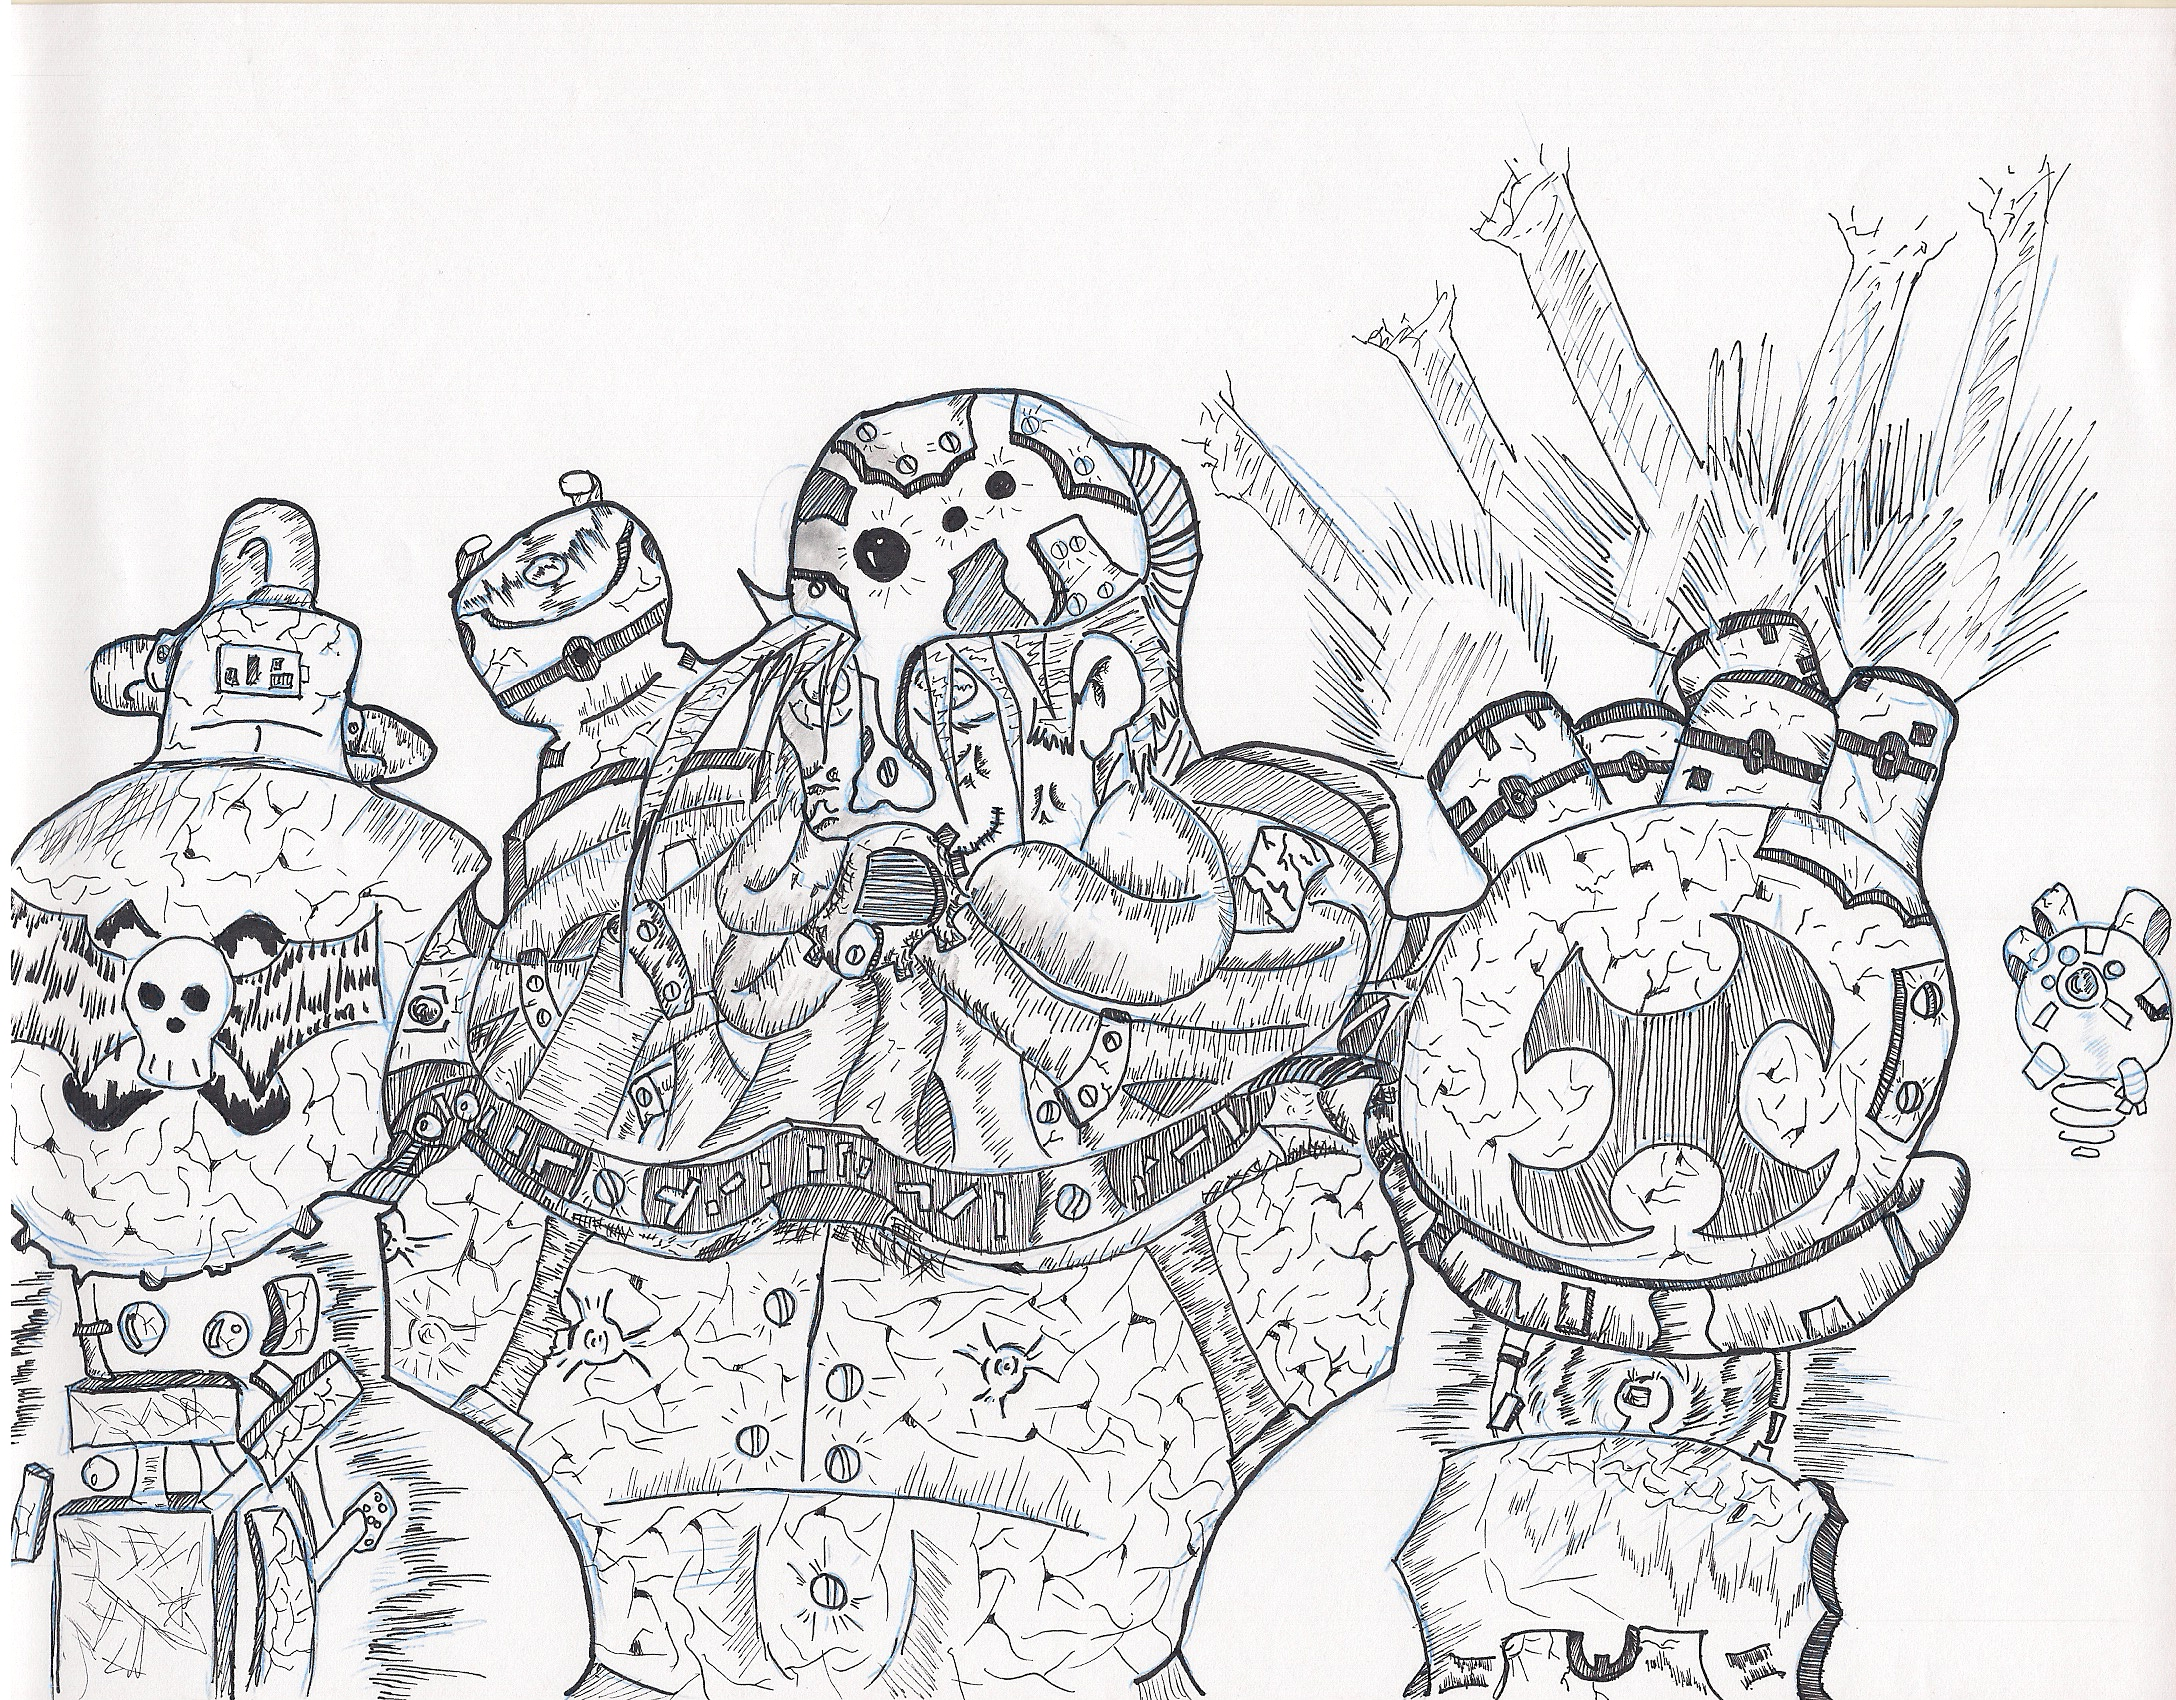 Machine or Man, all rage by Sturm75